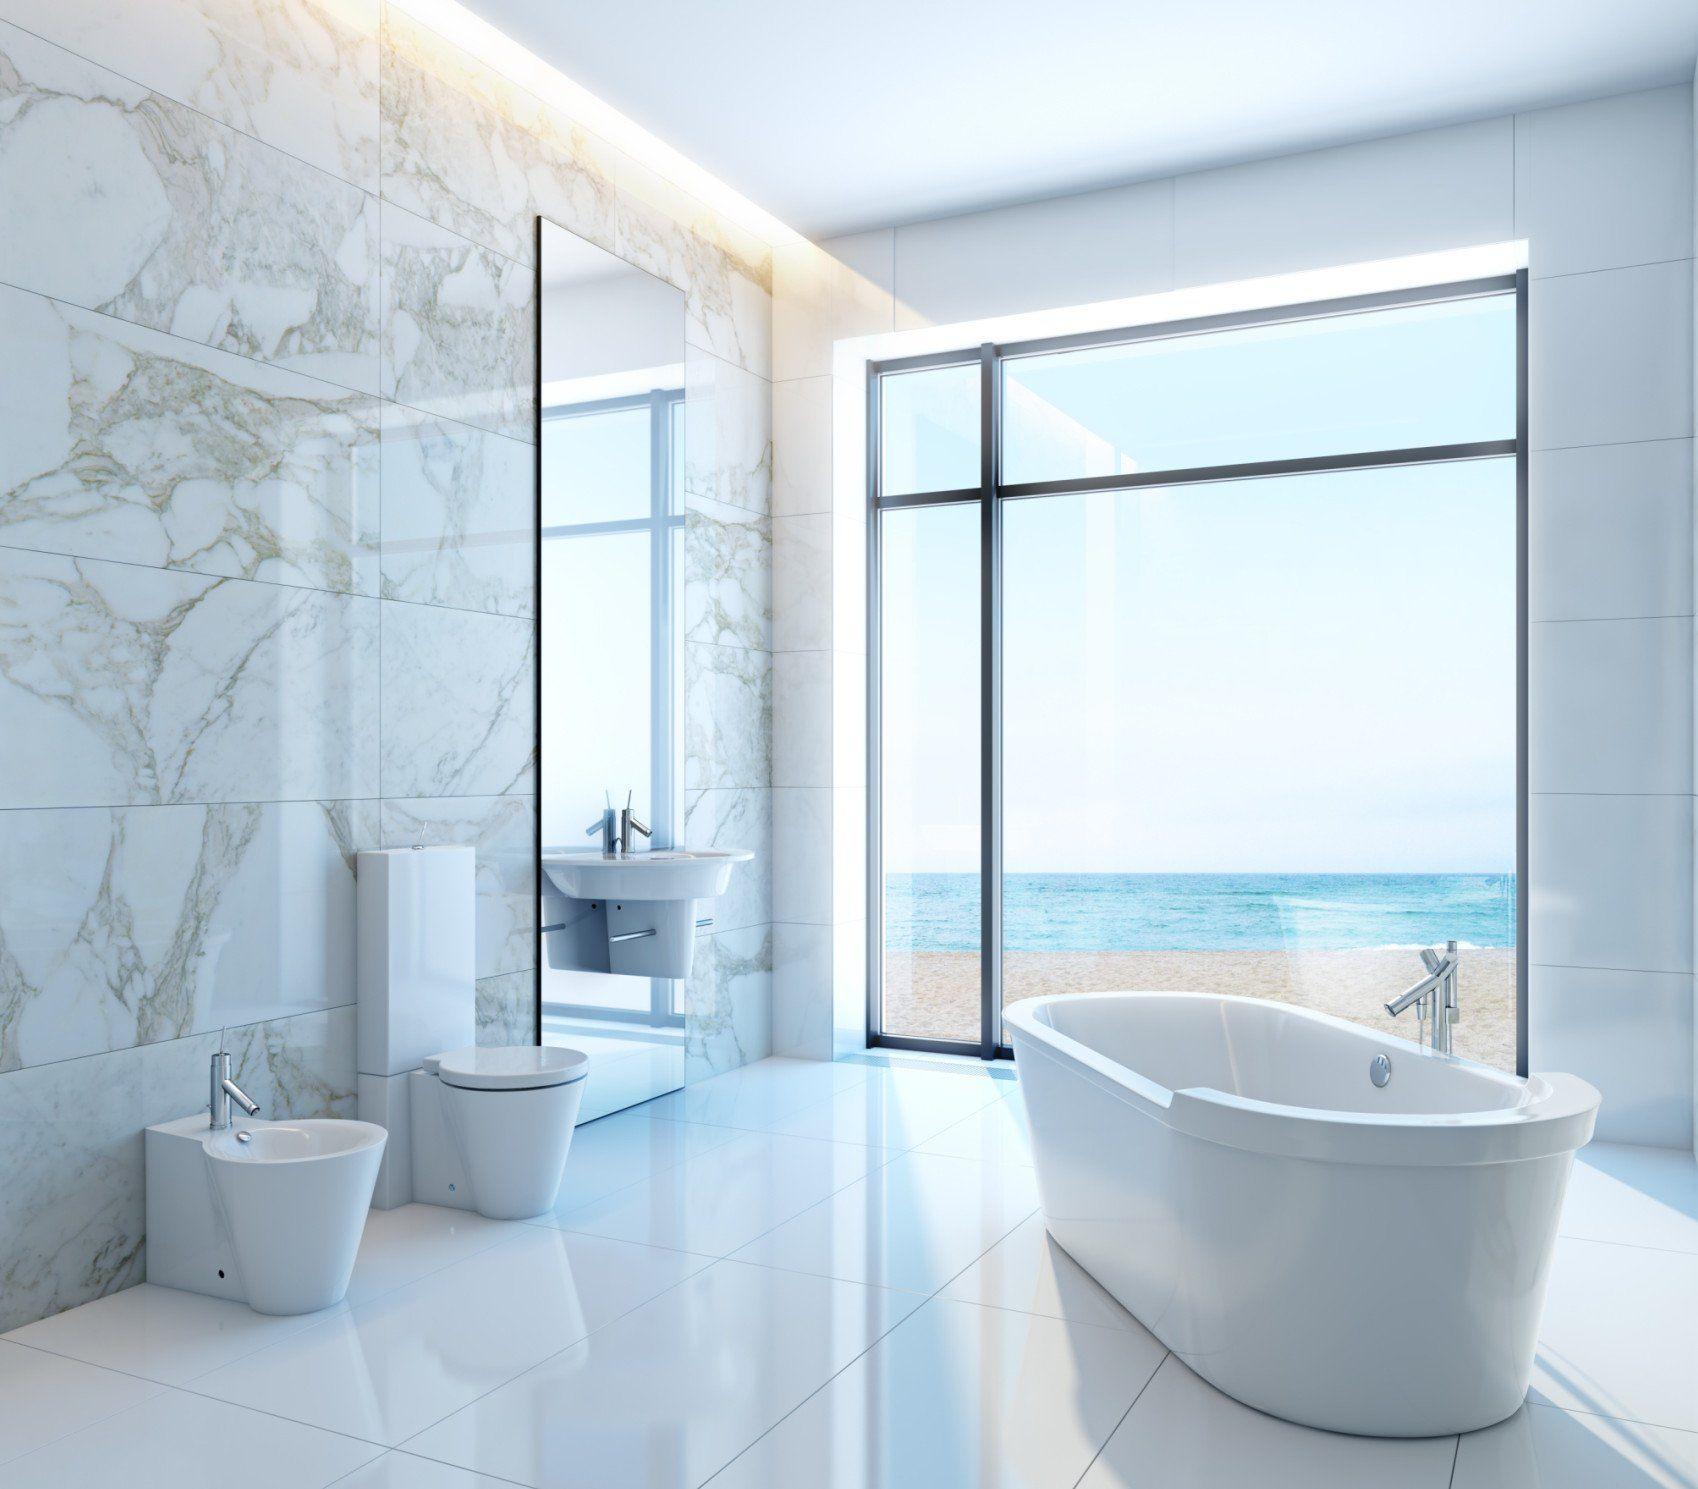 Moderne Badezimmer In Weiss Badezimmer Modernes Badezimmer Strandhaus Badezimmer